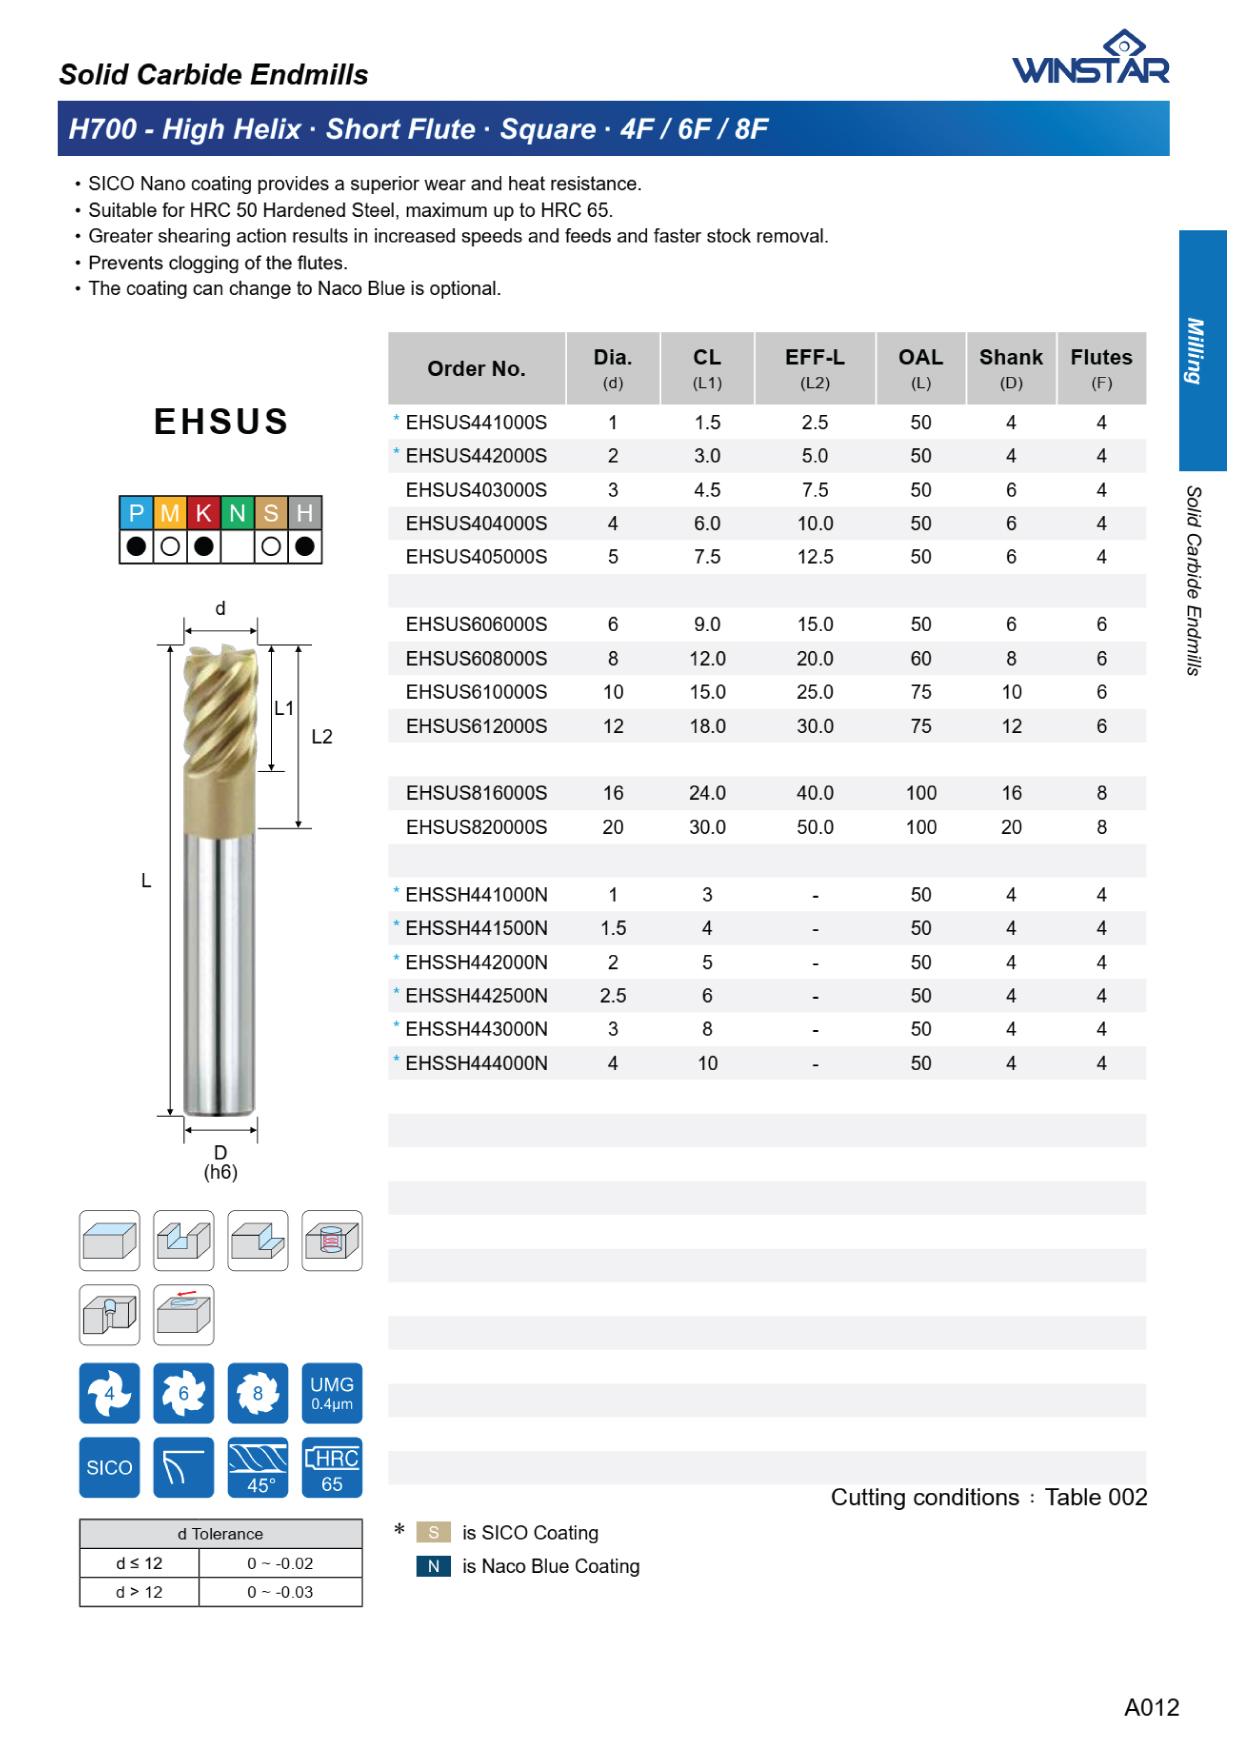 Dao Phay High Helix Short Flute Winstar EHSUS Series H700 1